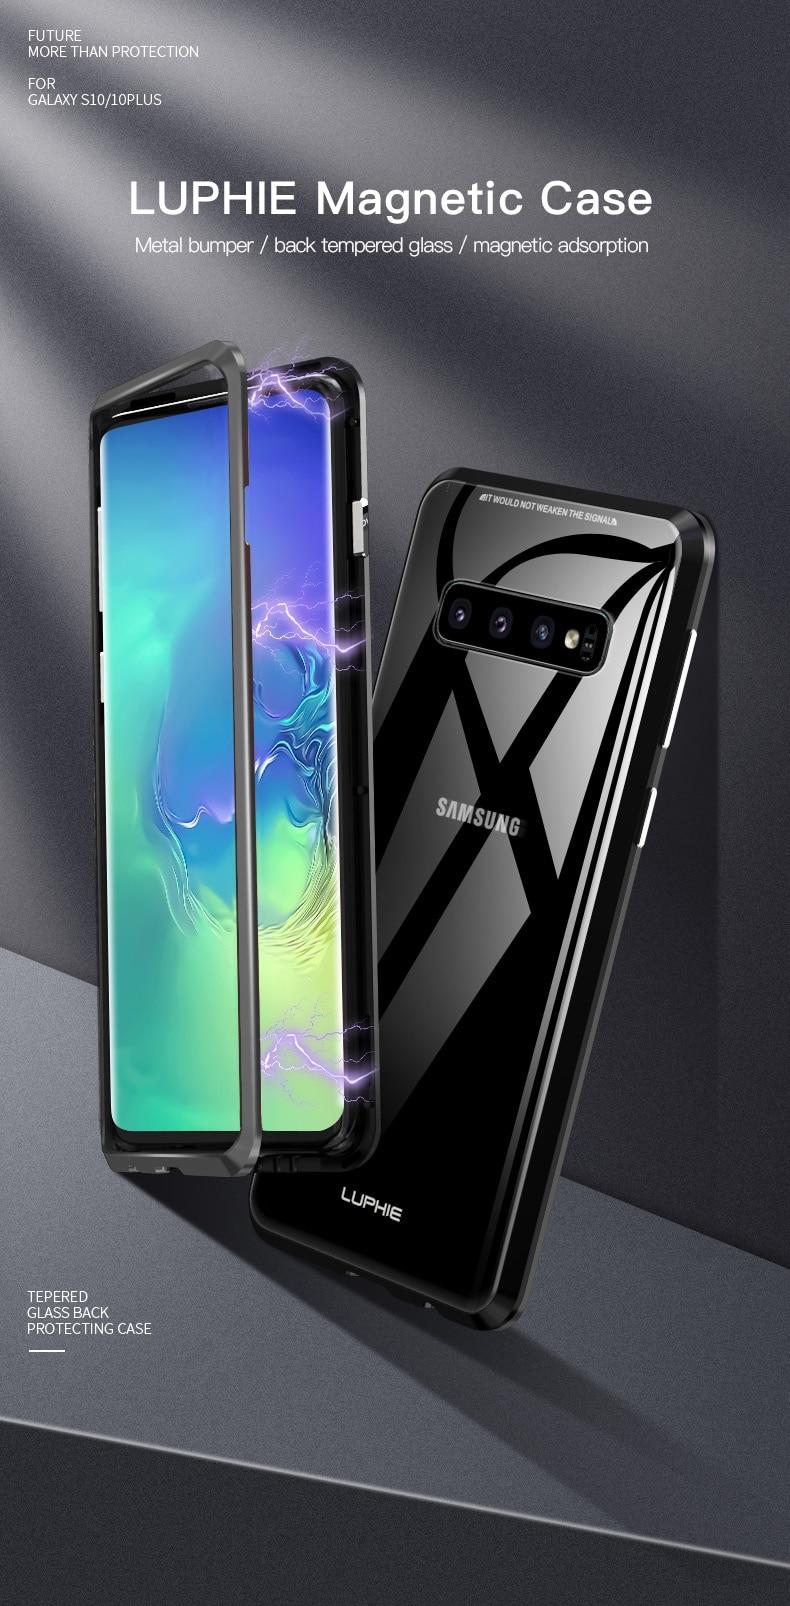 Samsung S10 Plus S10e magnet glass Case (1)